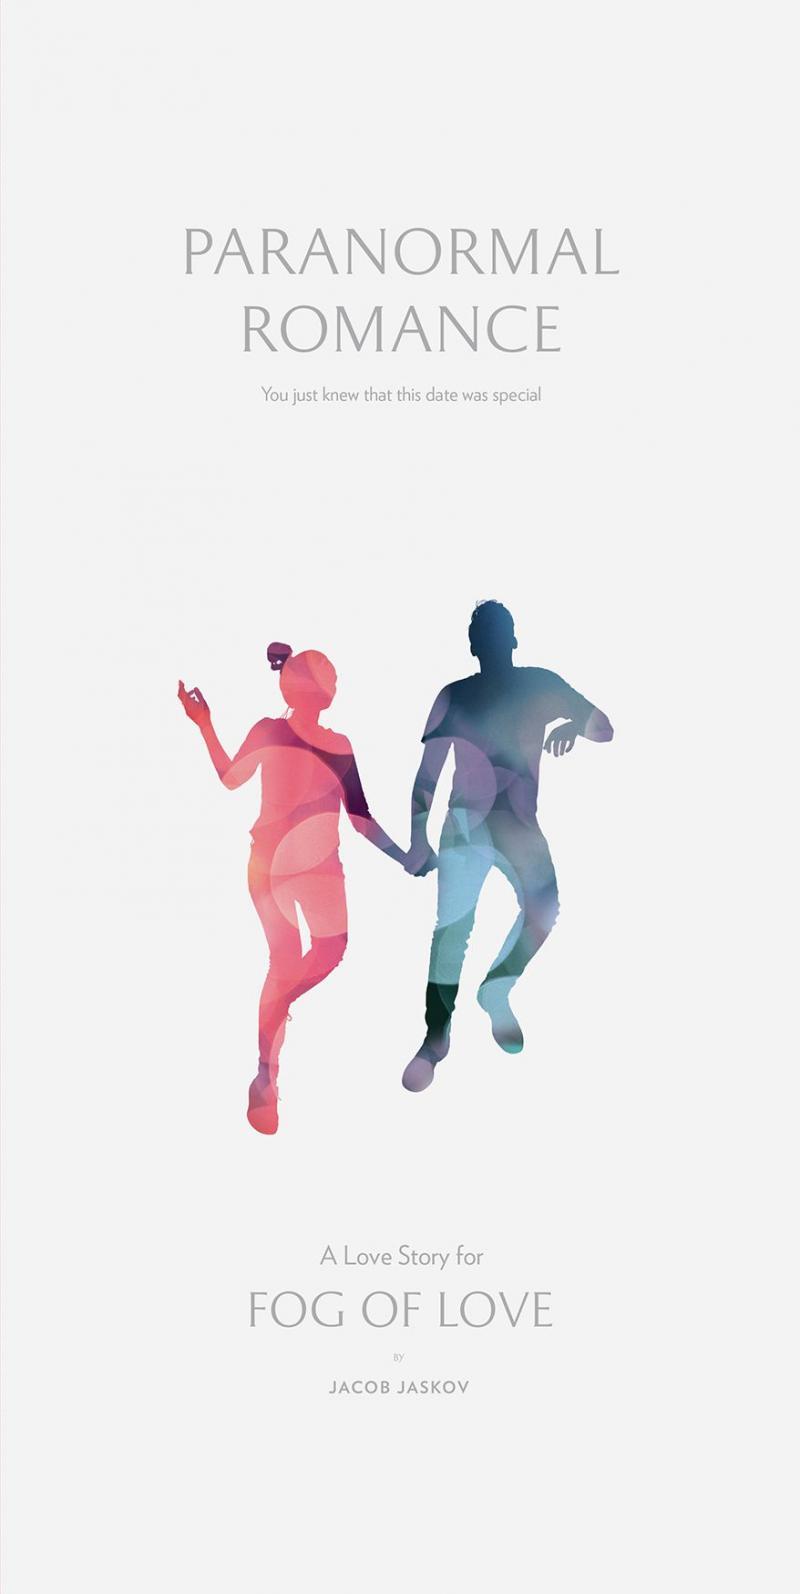 настольная игра Fog of Love: Paranormal Romance Туман Любви: Паранормальный Роман